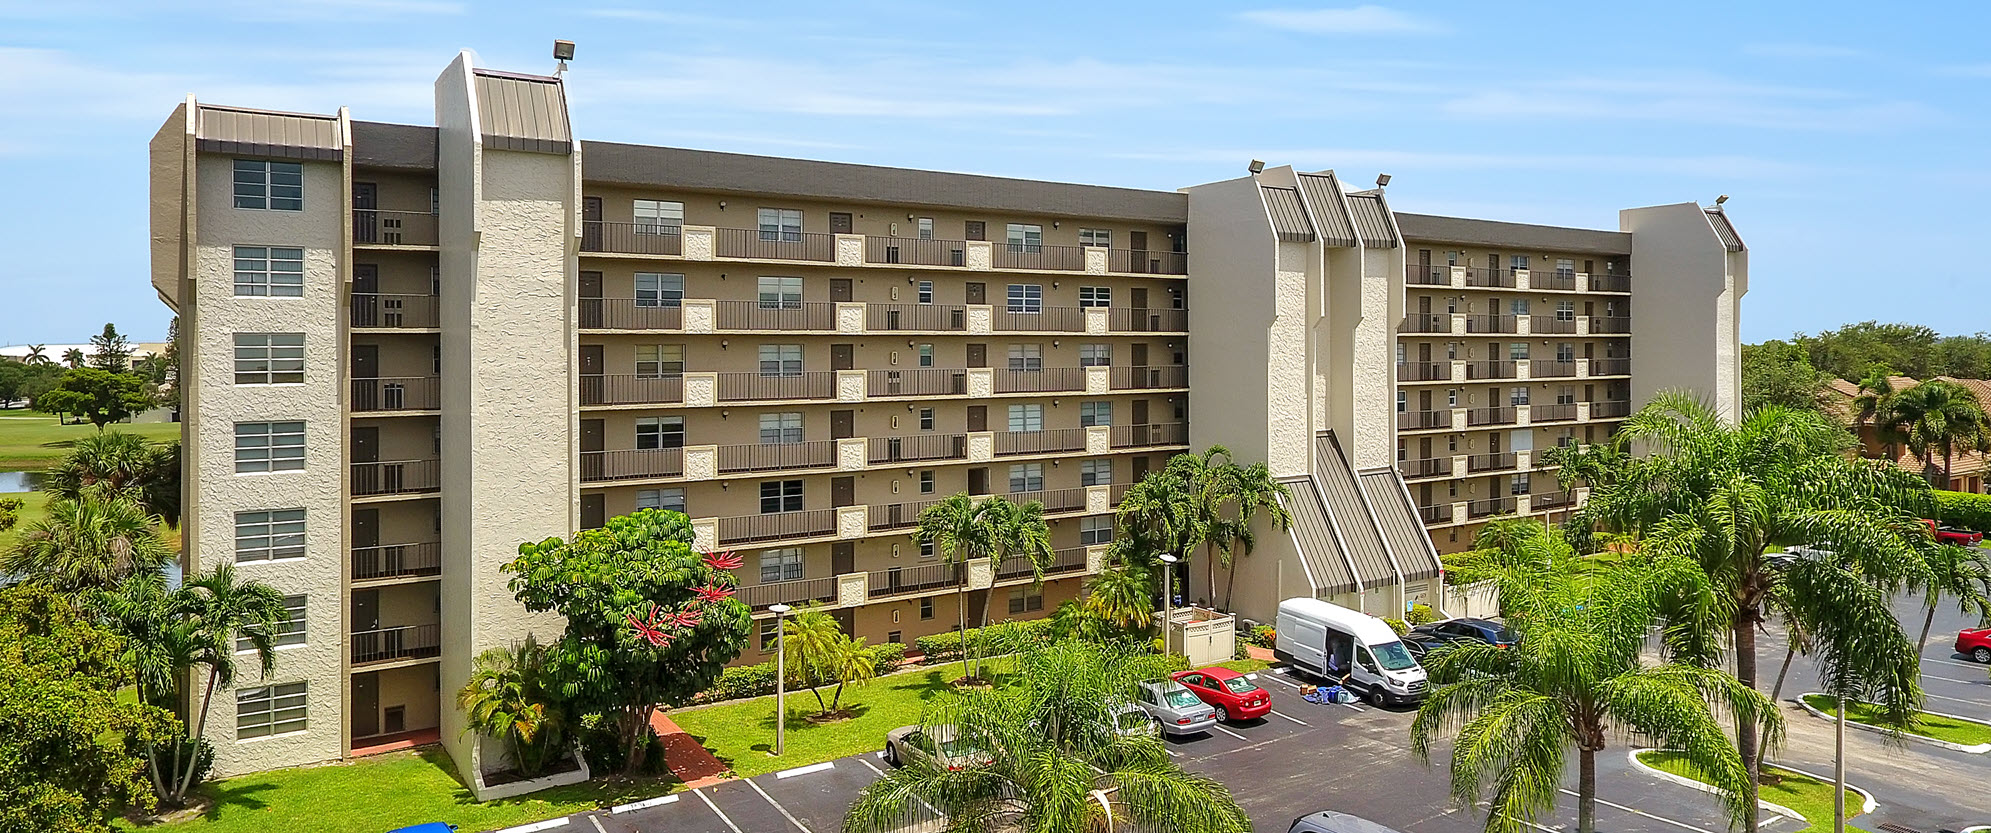 rolling hills condominium davie fl 33328 buying page image